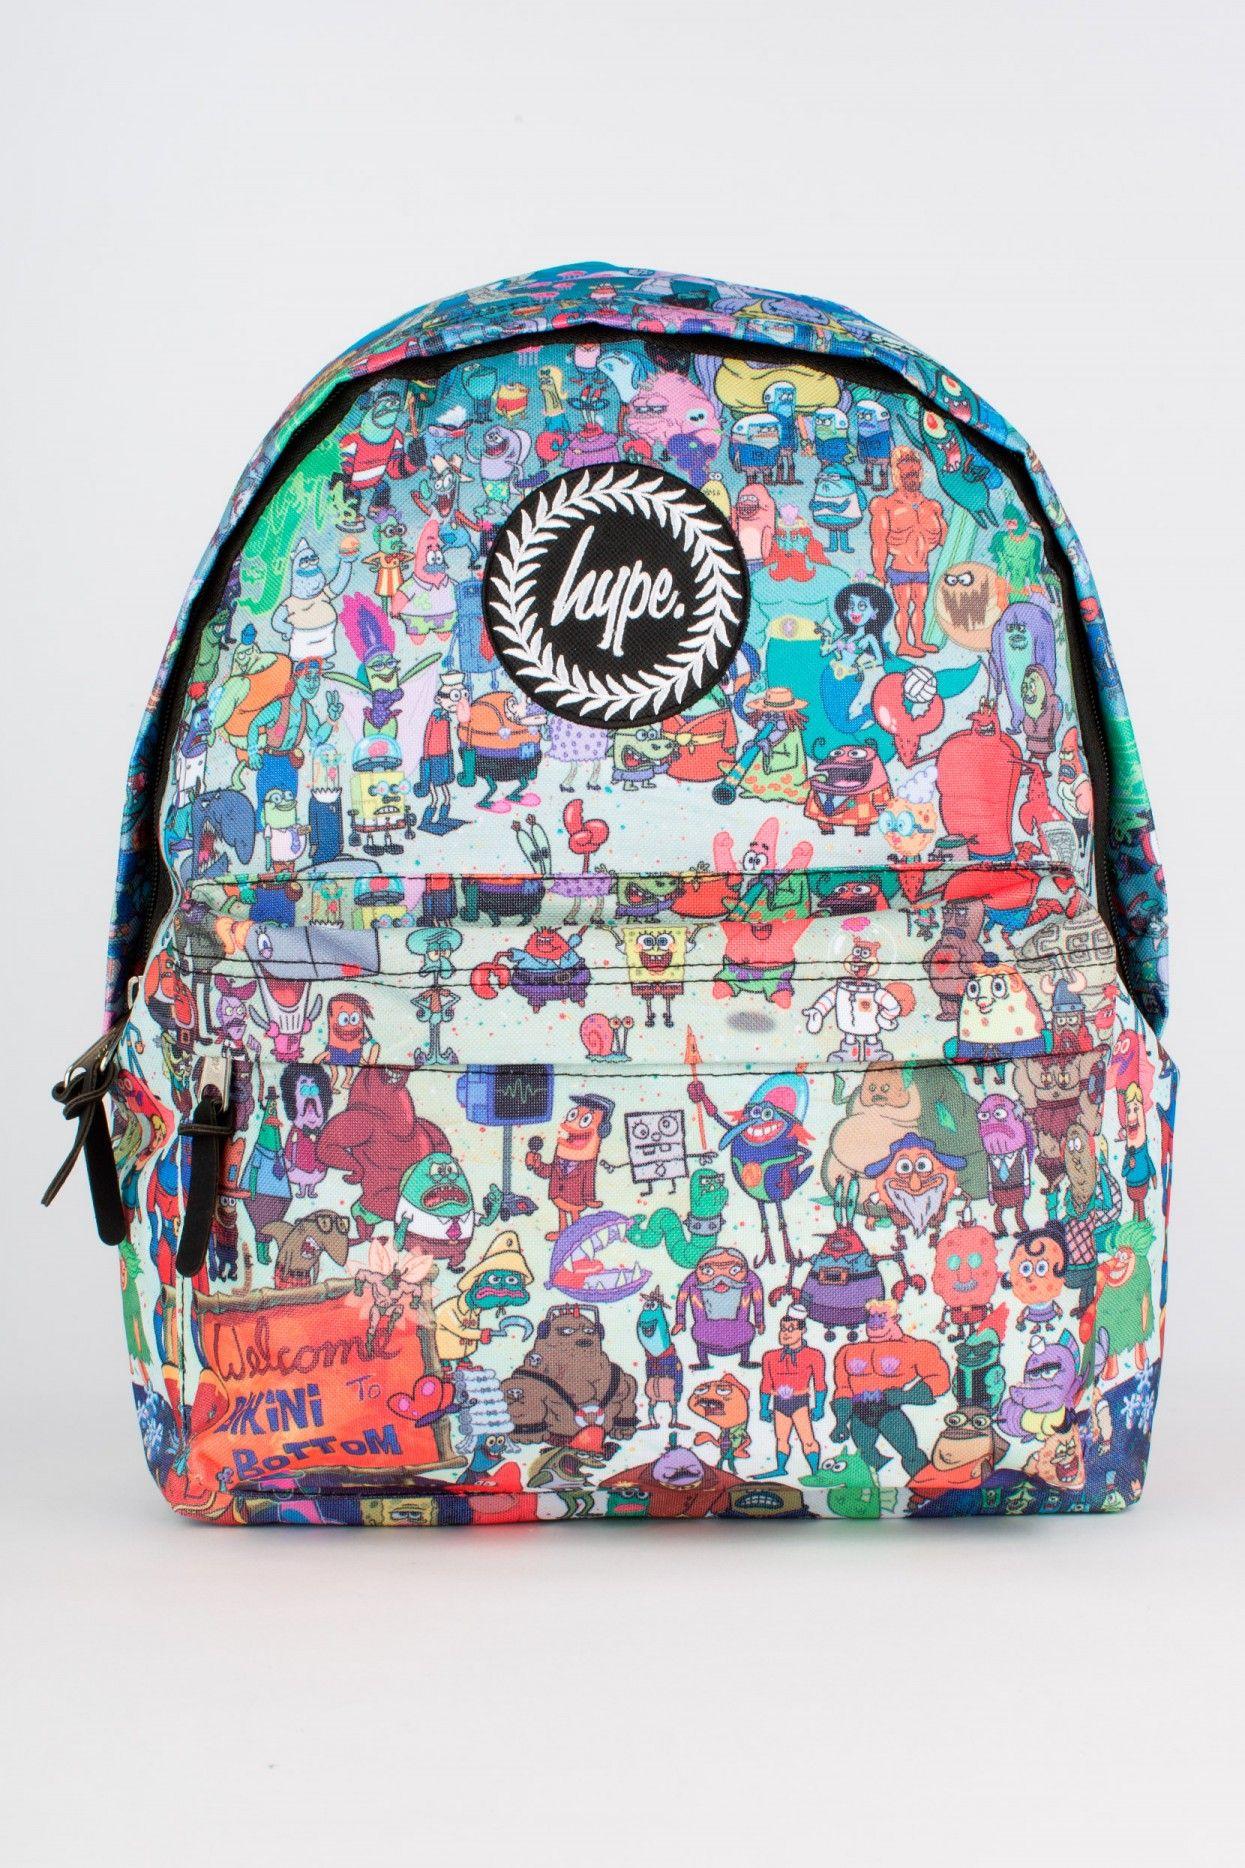 hype x spongebob everyone backpack spongebob squarepants